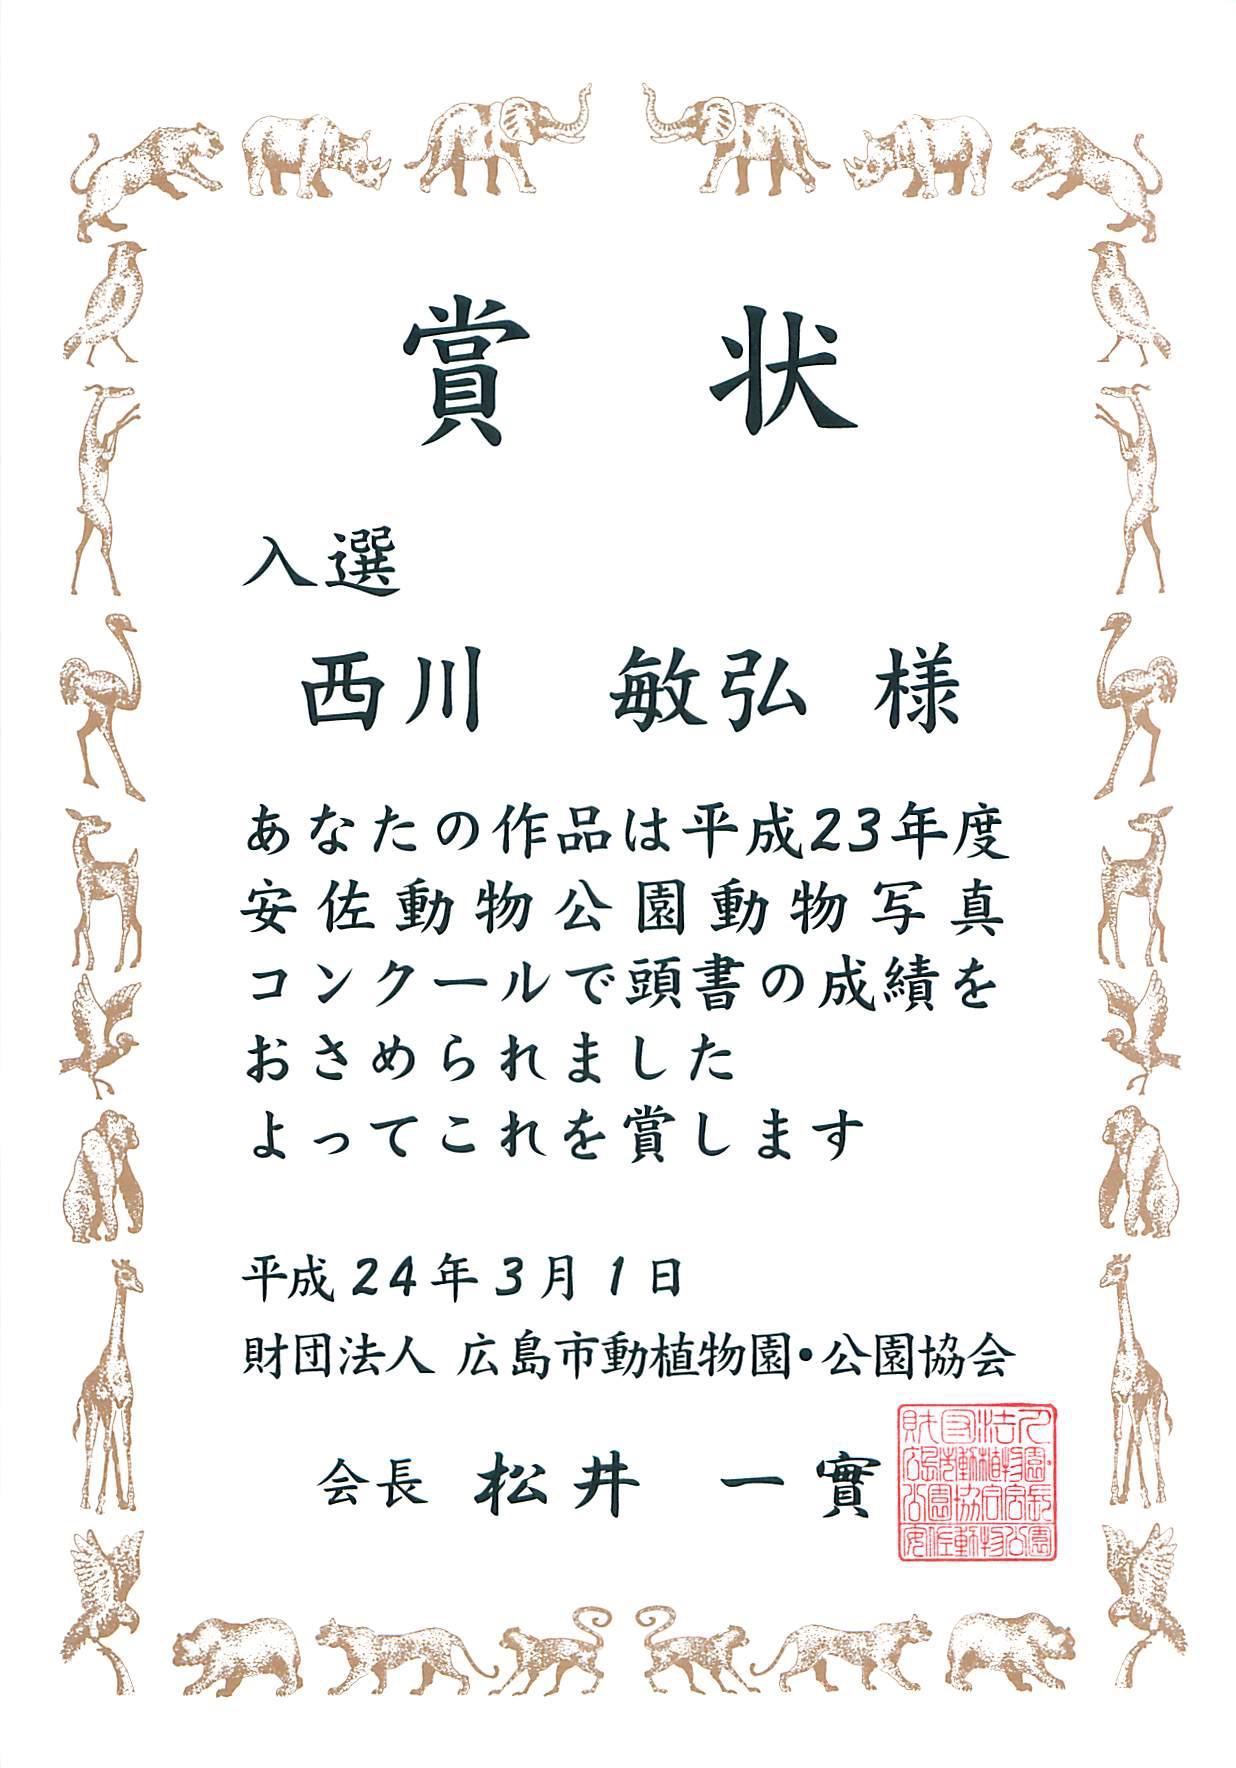 平成23年度第26回安佐動物公園動物写真コンクール 入賞(入選)_a0288226_23563353.jpg